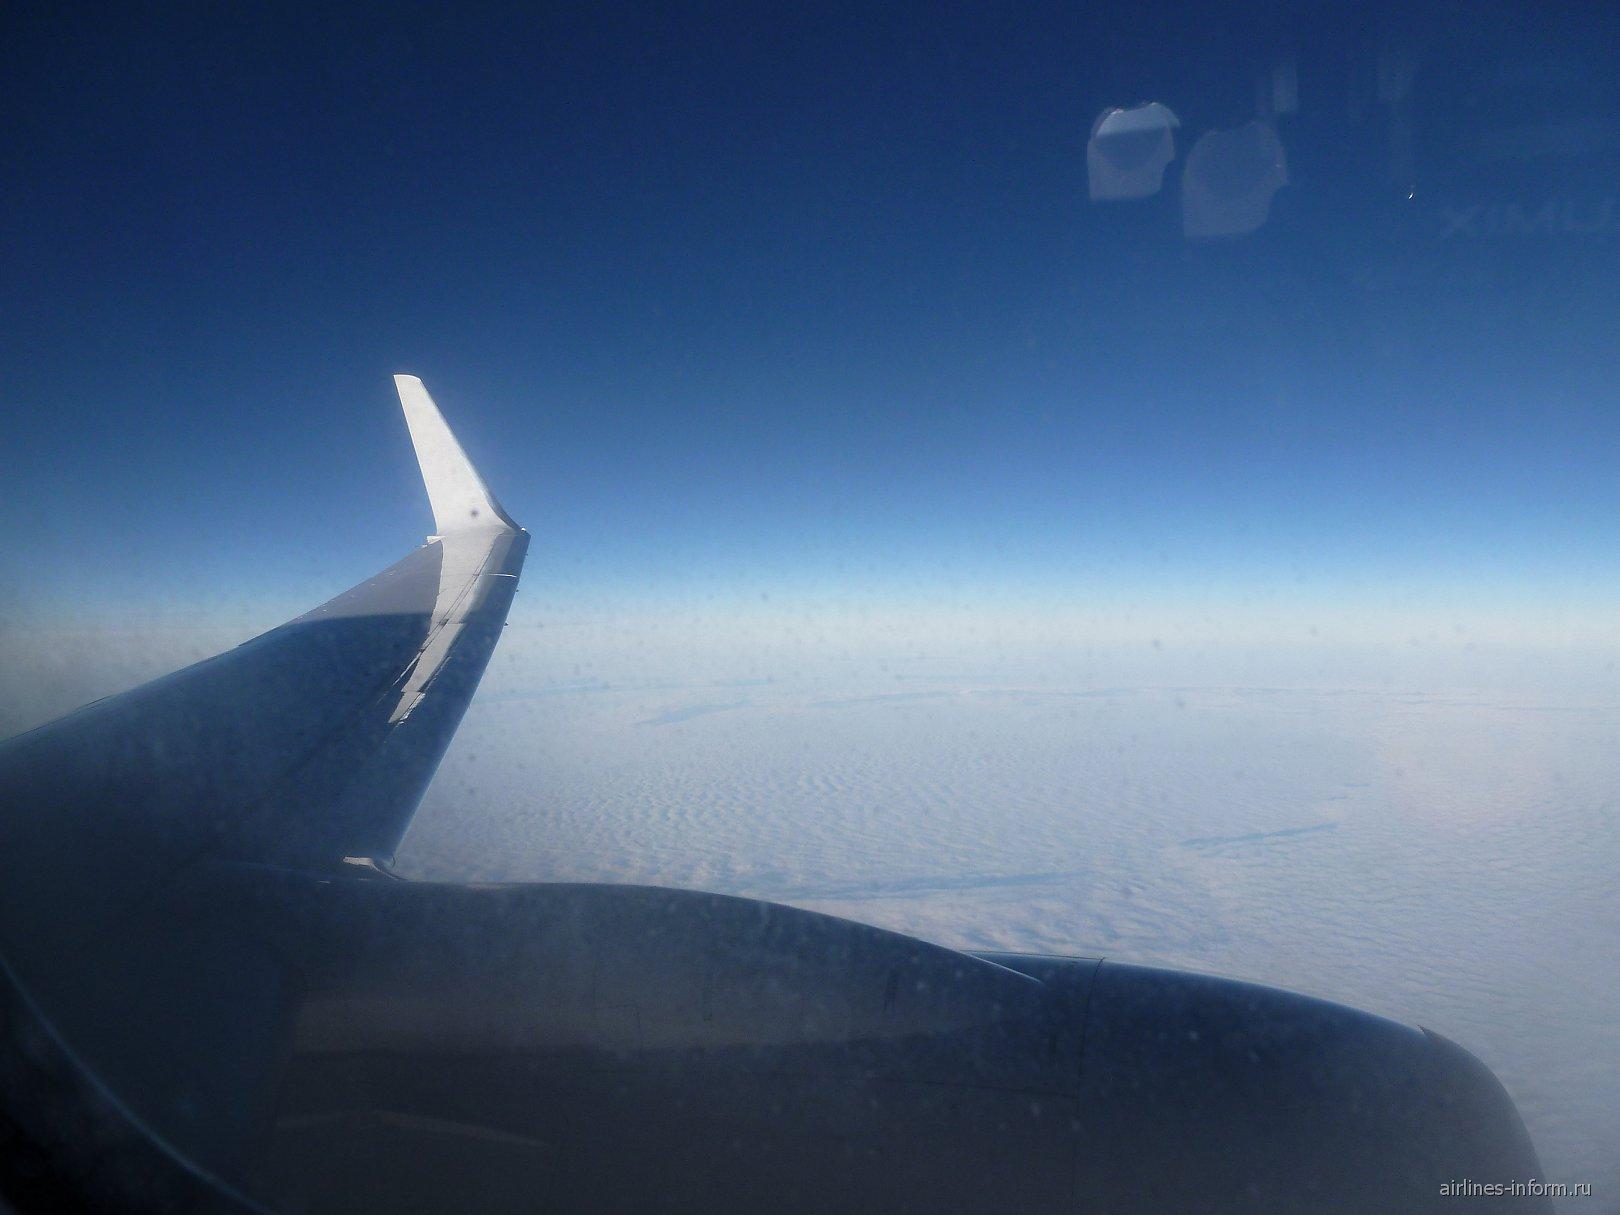 Рейс Ноябрьск-Москва авиакомпании ЮТэйр